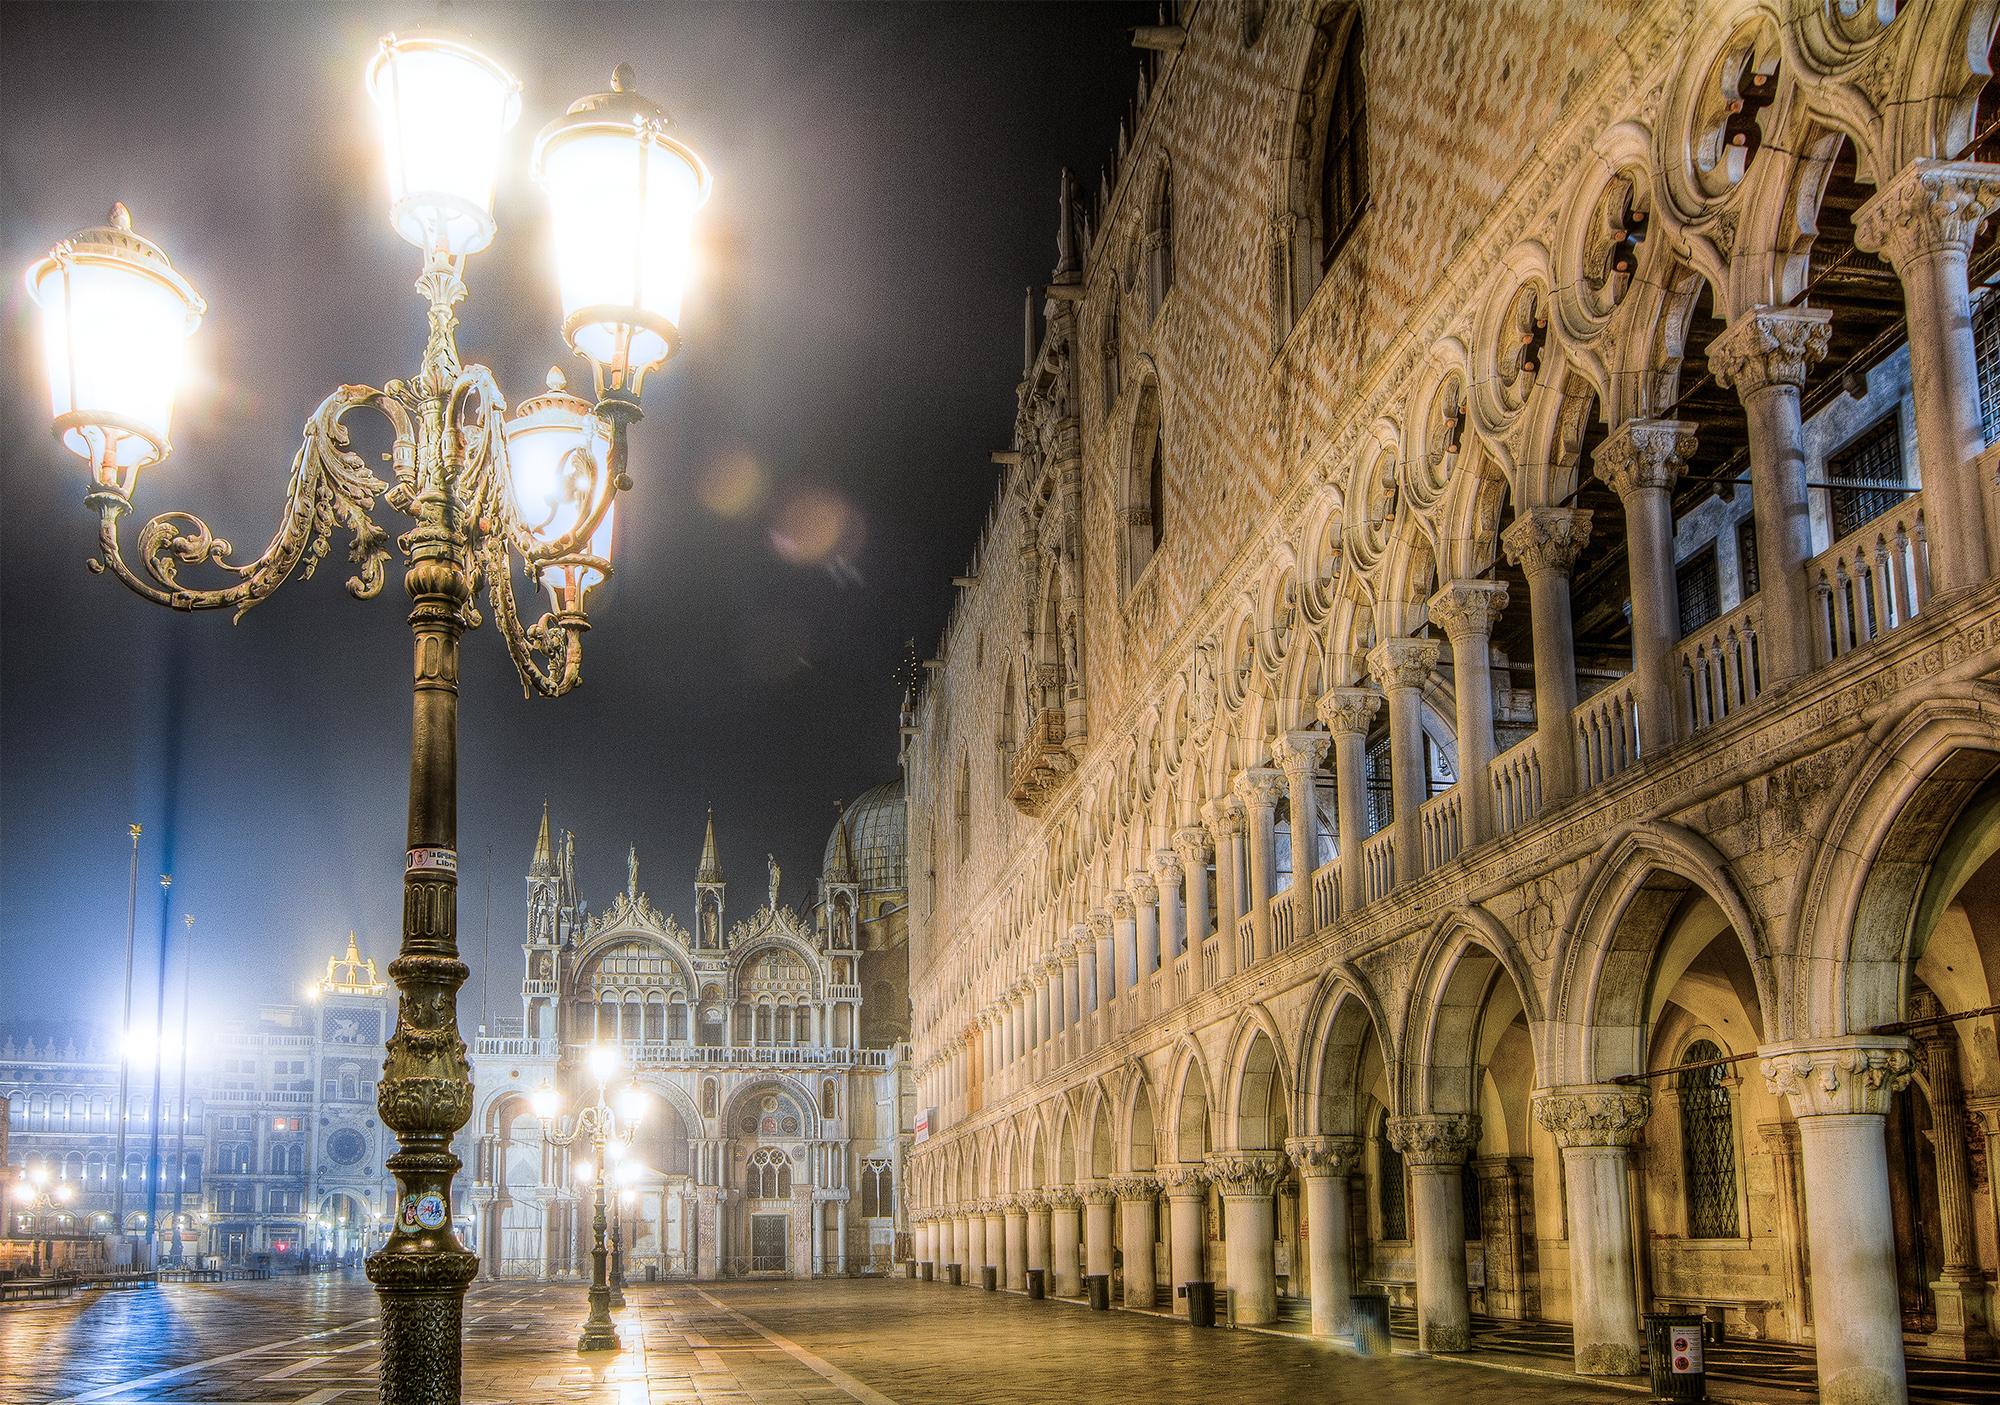 Lights ofPiazza San Marco, Venice